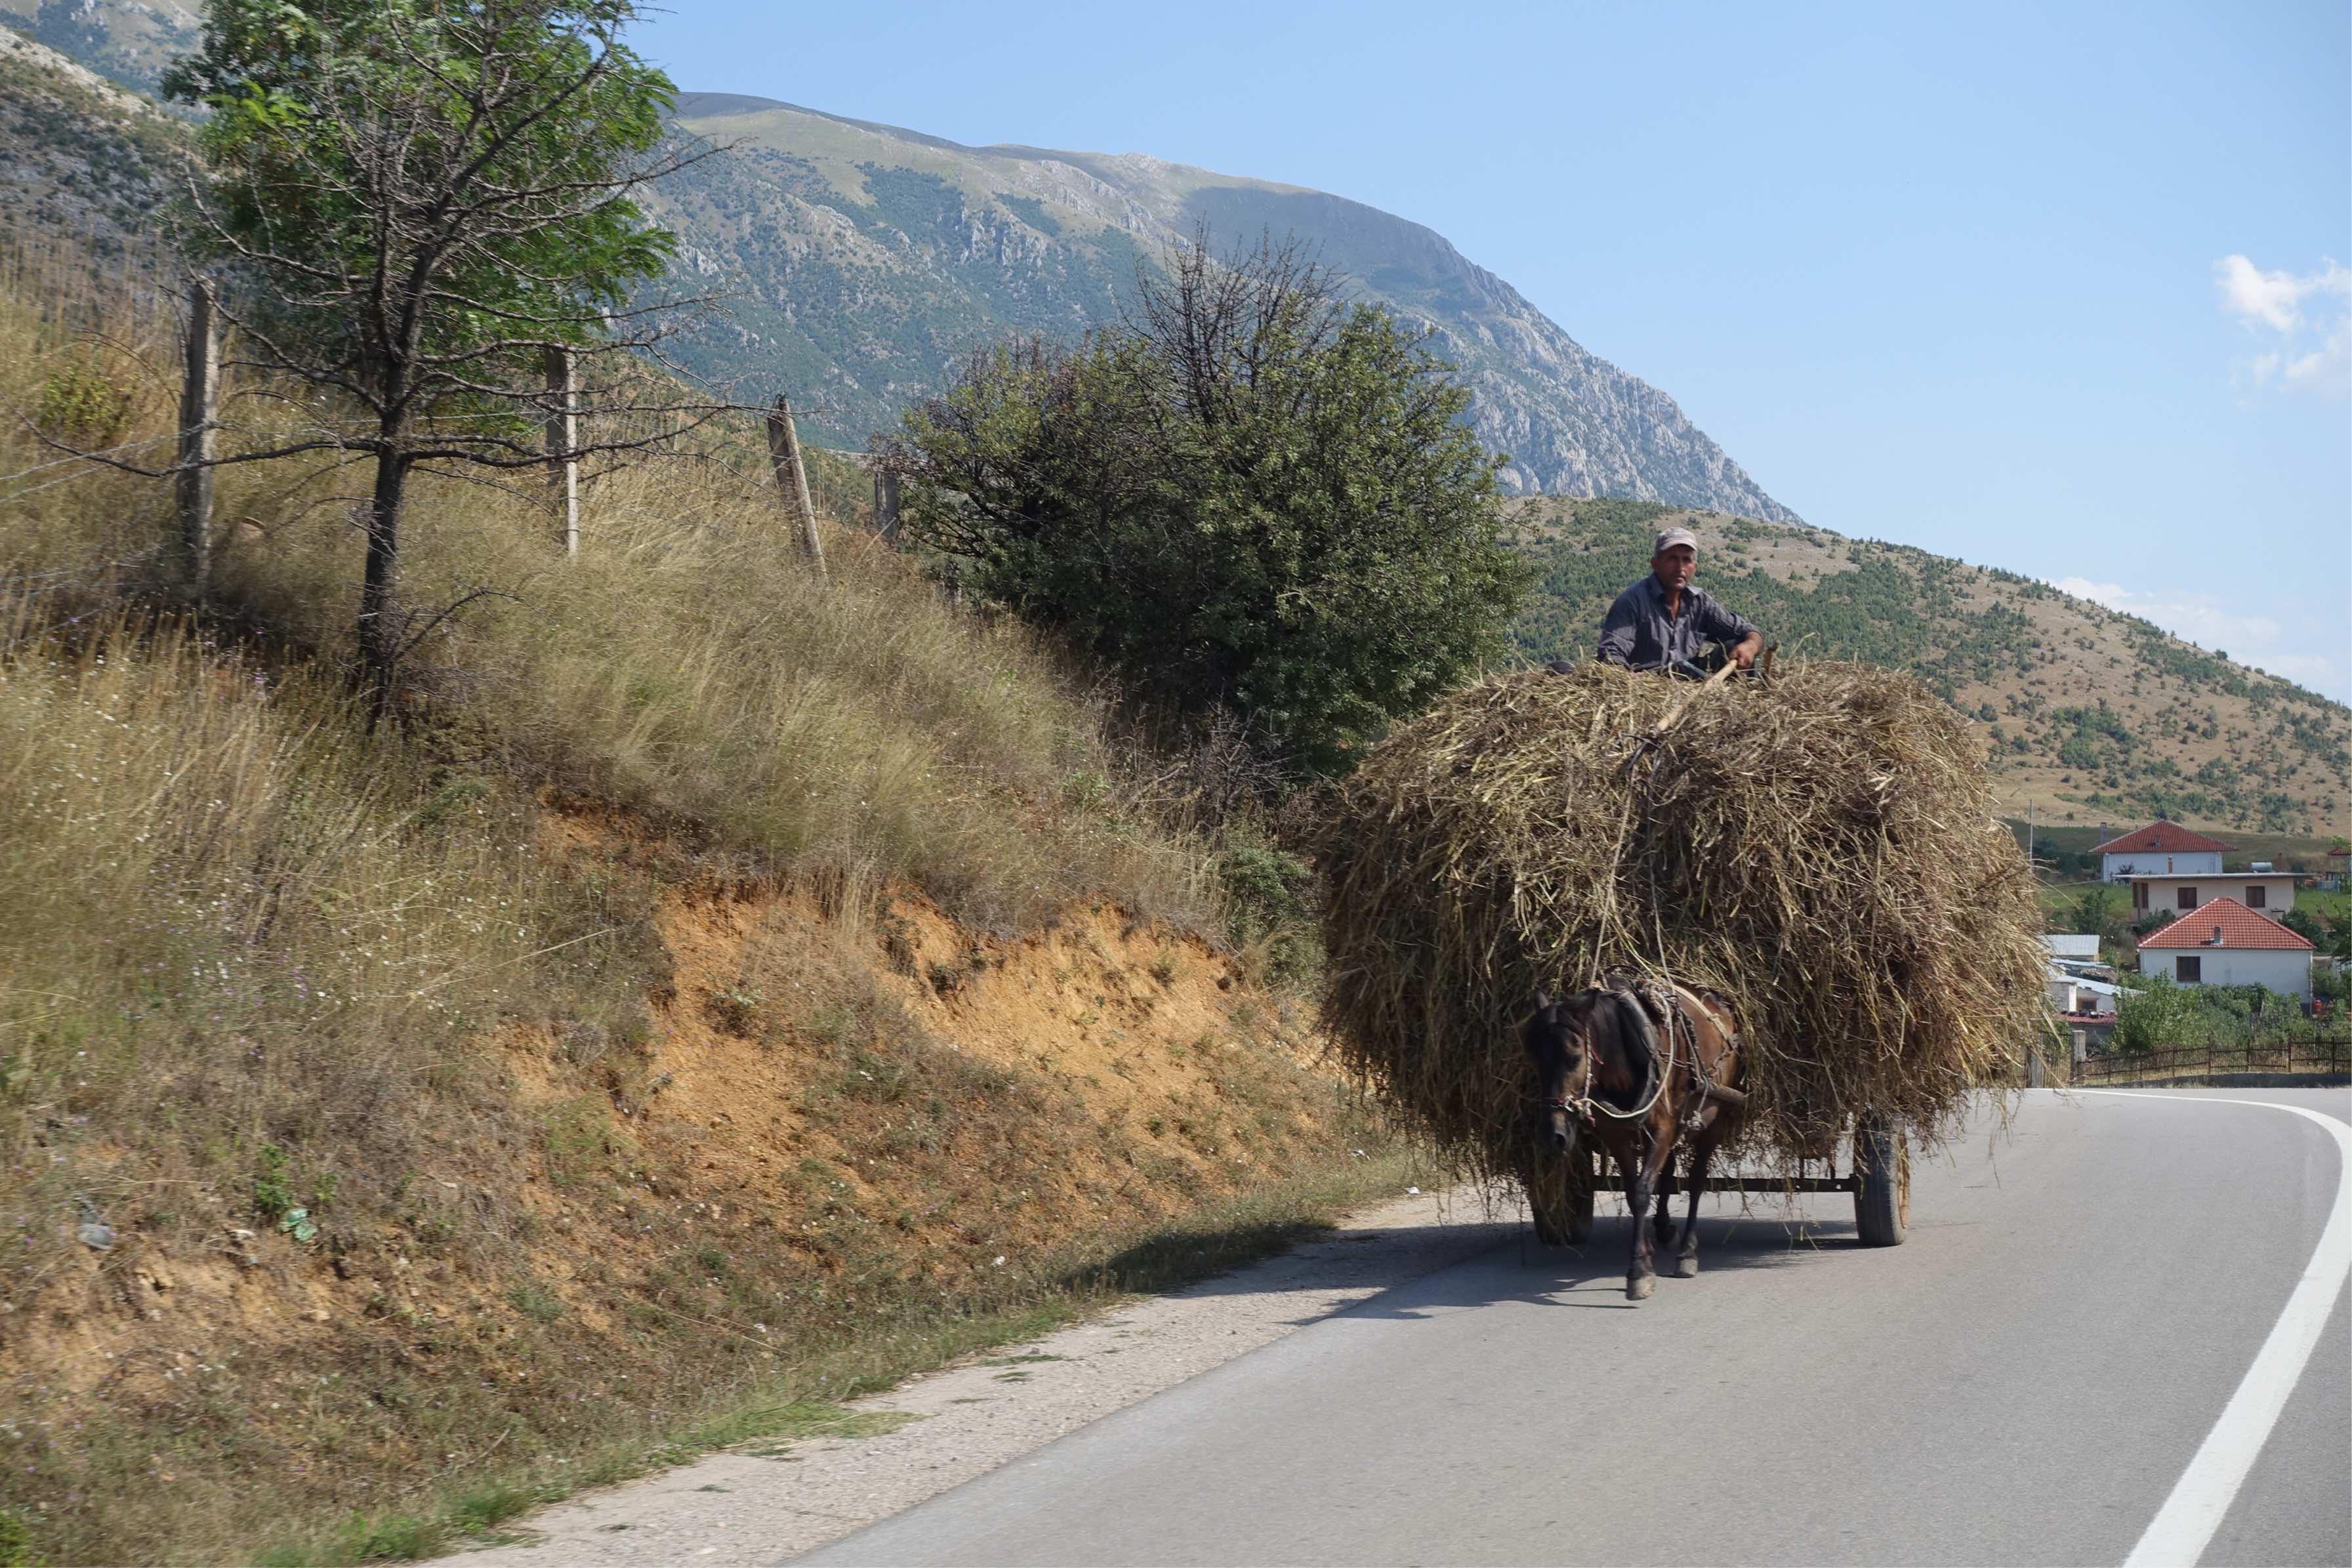 15 Août 2014 – Traversée de l'Albanie